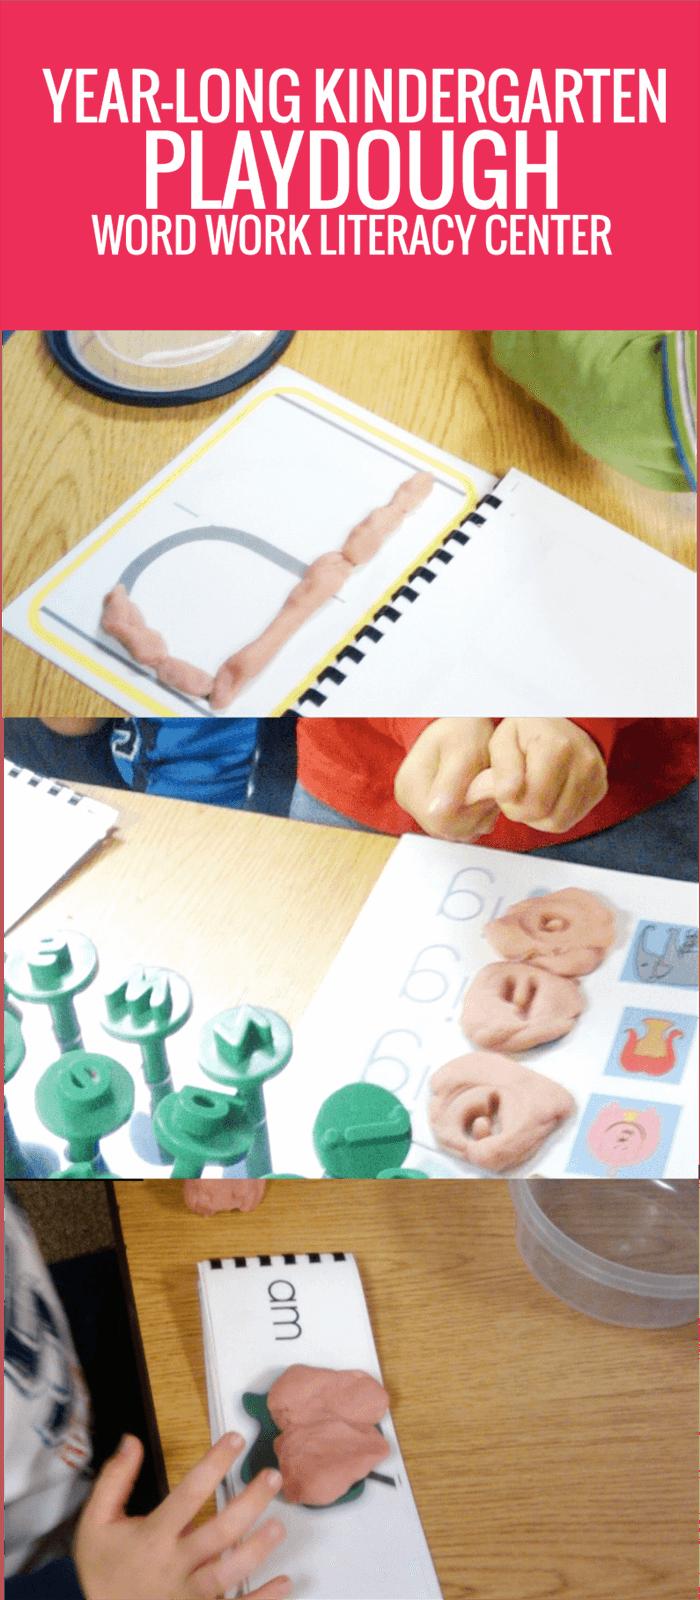 Year Long Playdough Literacy Center for Kindergarten Word Work